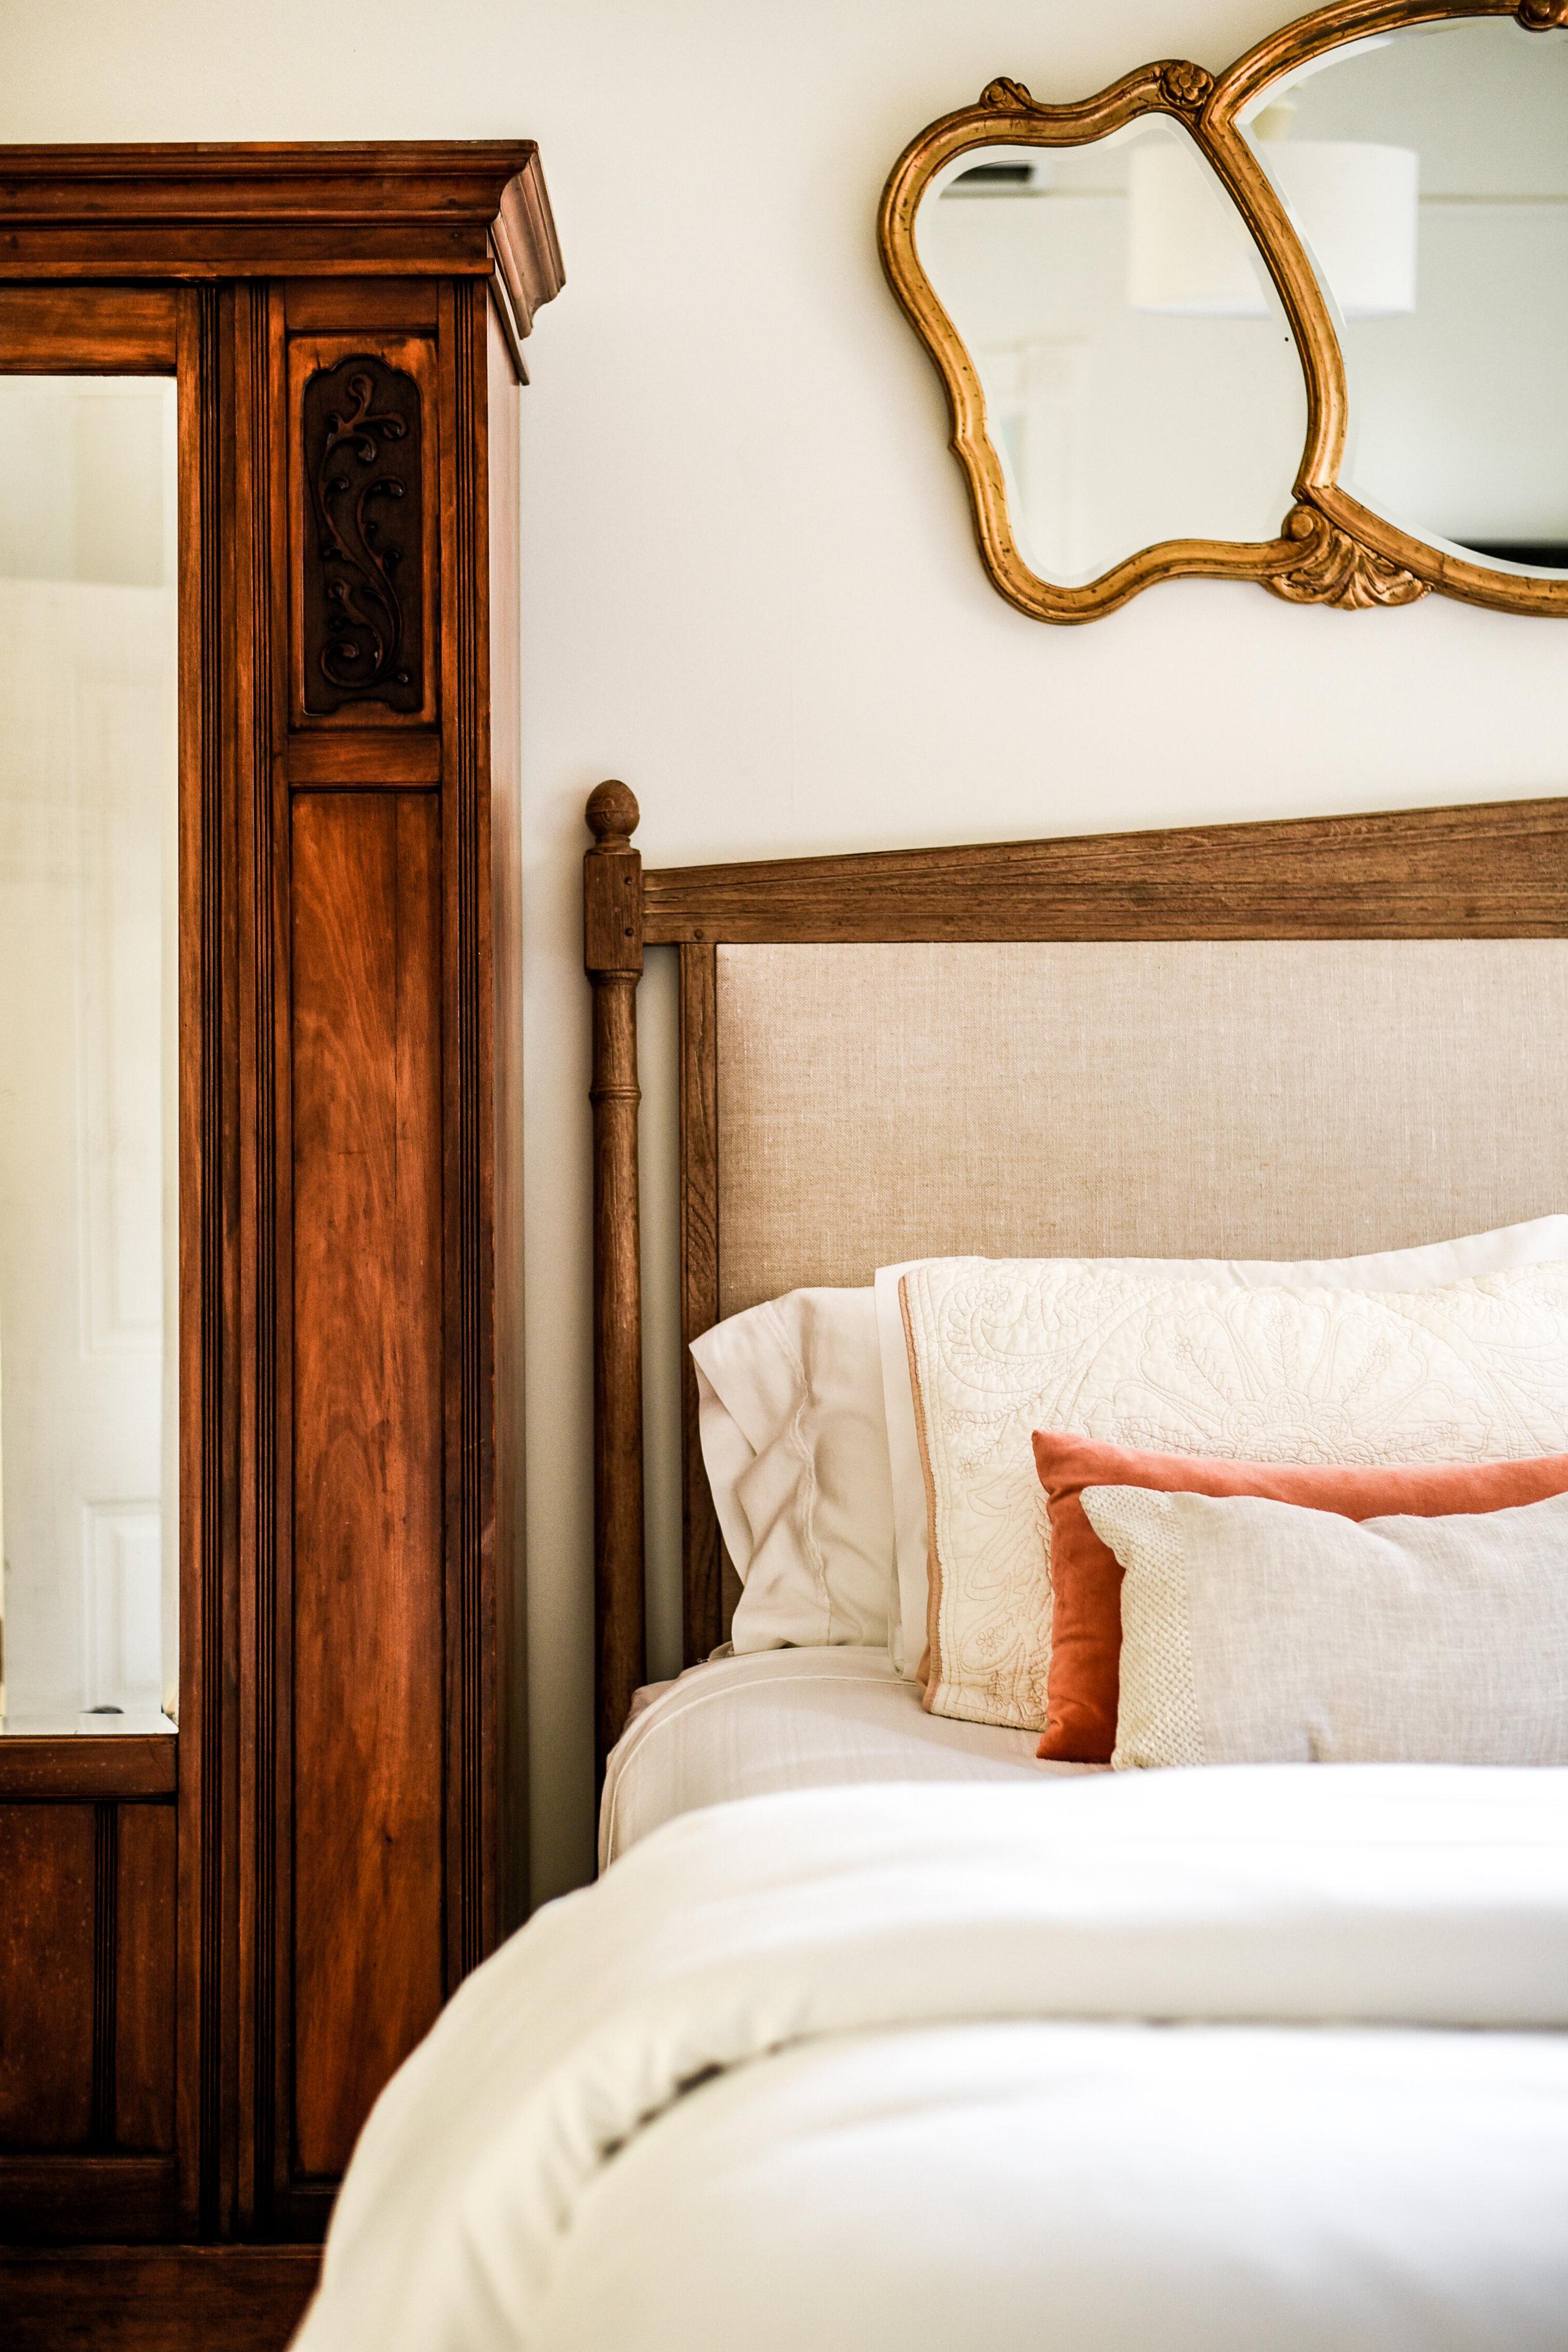 Beautiful Bed & Breakfast in Northern California | boxwoodavenue.com